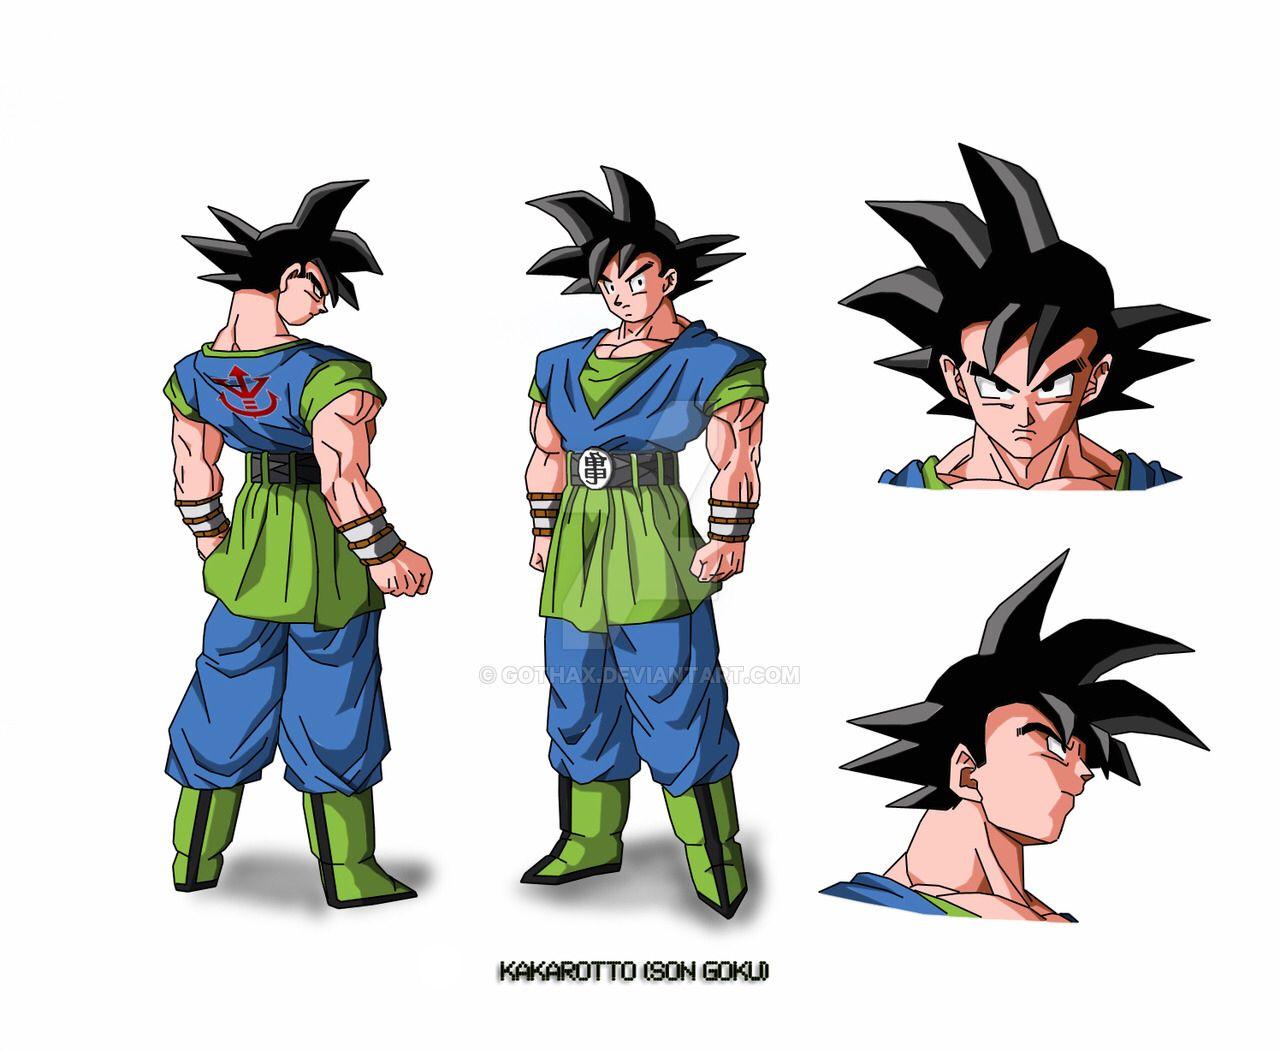 Goku AF by Gothax on @DeviantArt   Goku   Pinterest   Goku, Dragon ...